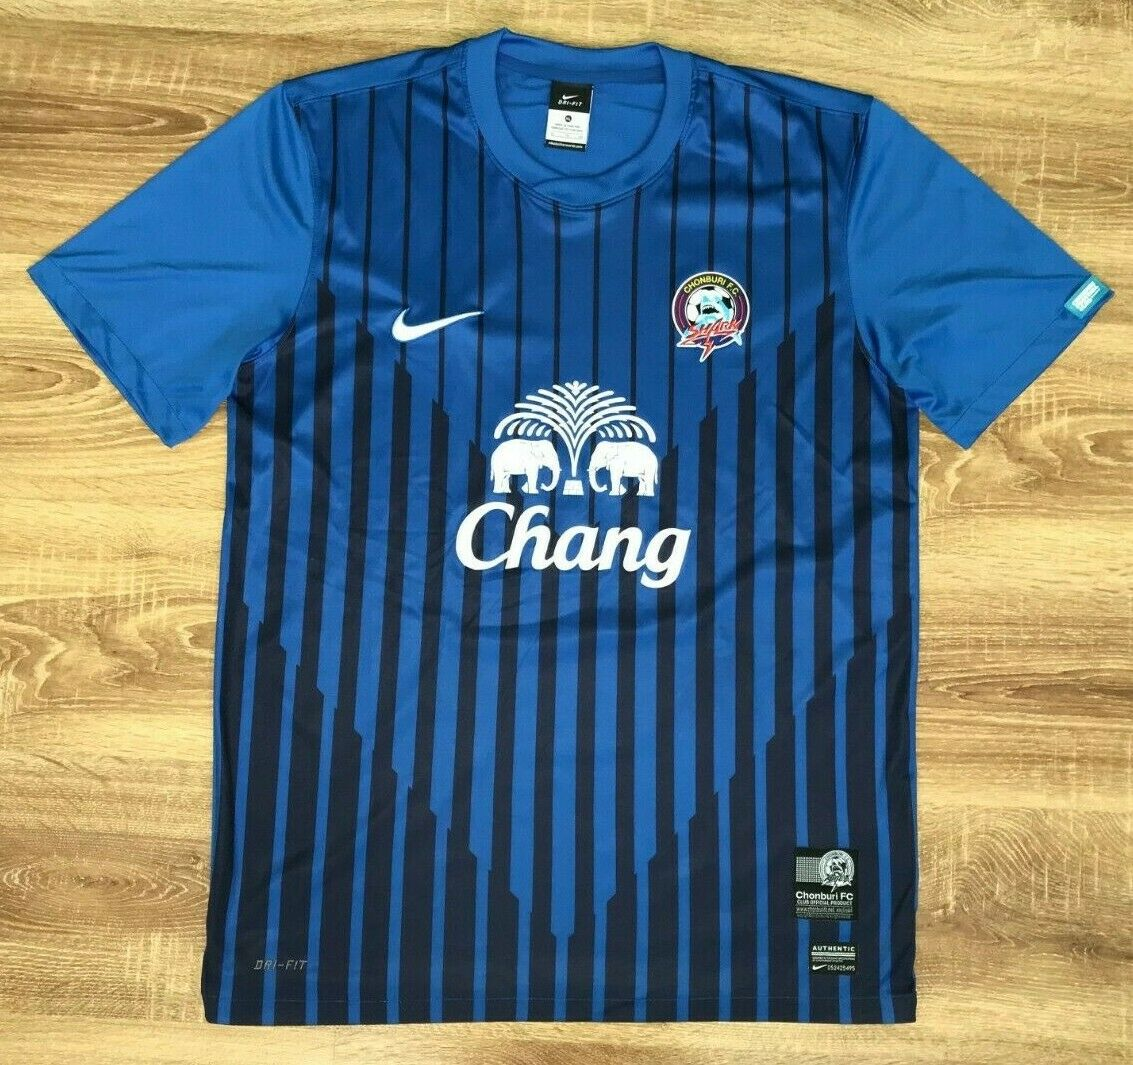 Chonburi Tiburones Tailandia 2012 Muy Raro Home Camisa Tamaño XL